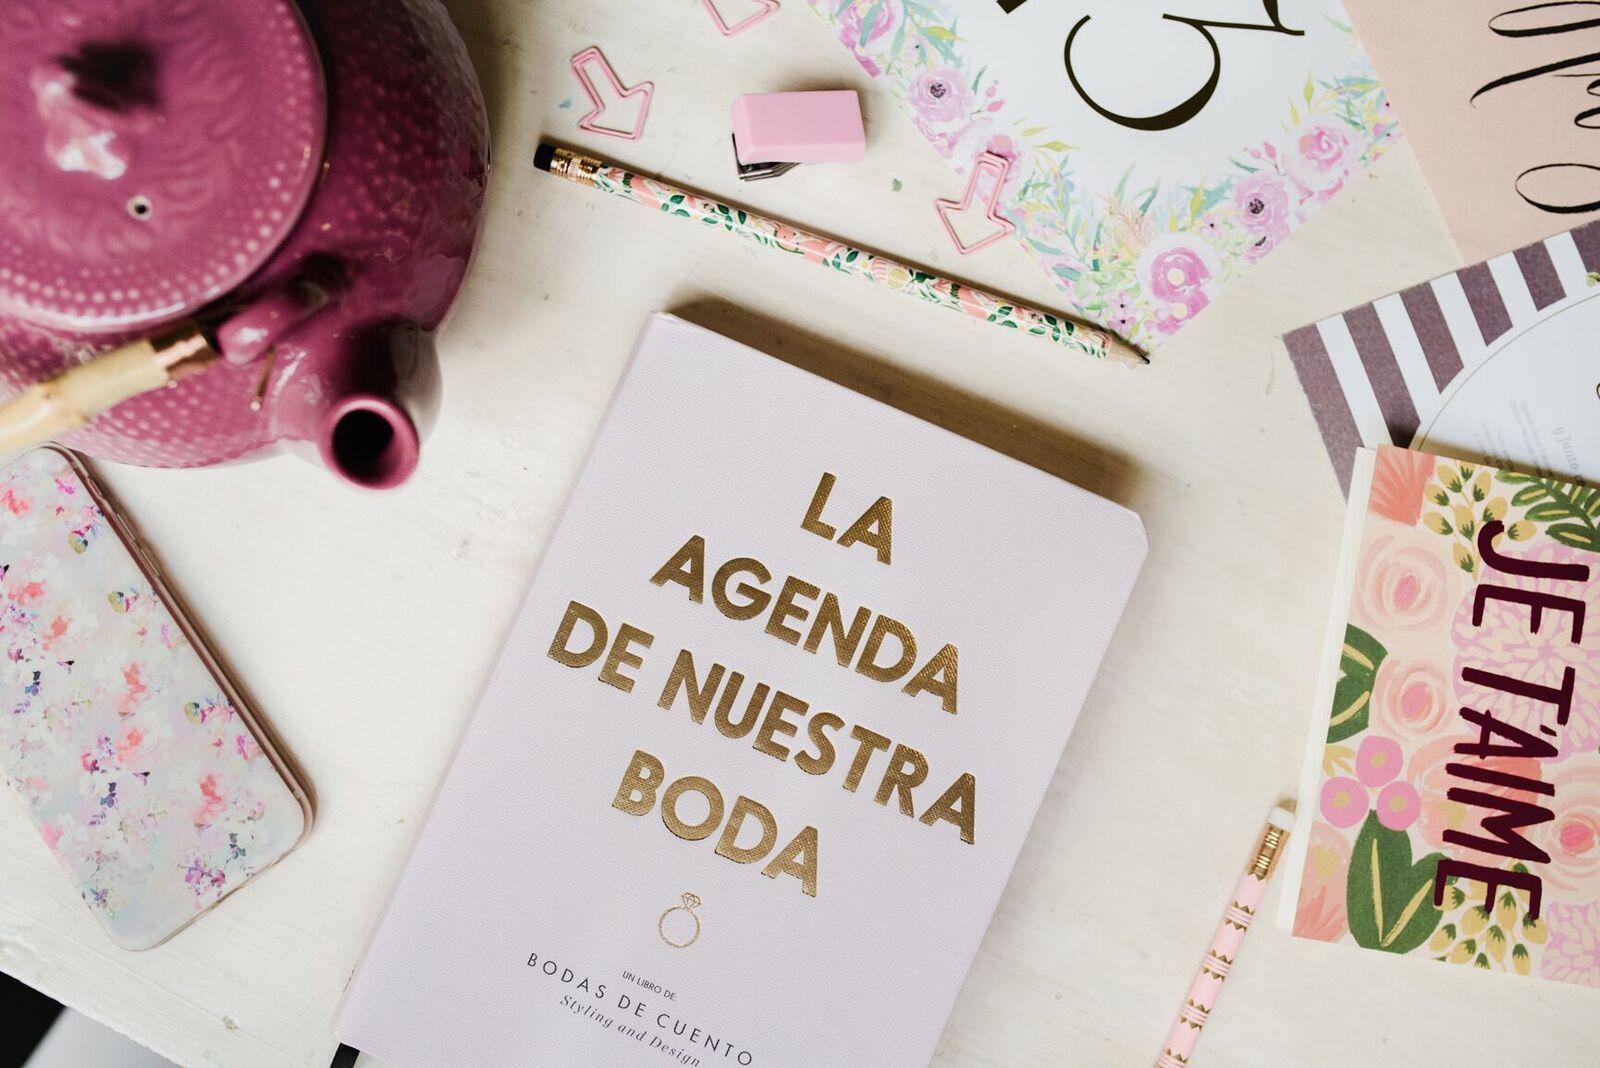 La agenda perfecta para tu boda agenda boda - Cosas para preparar una boda ...